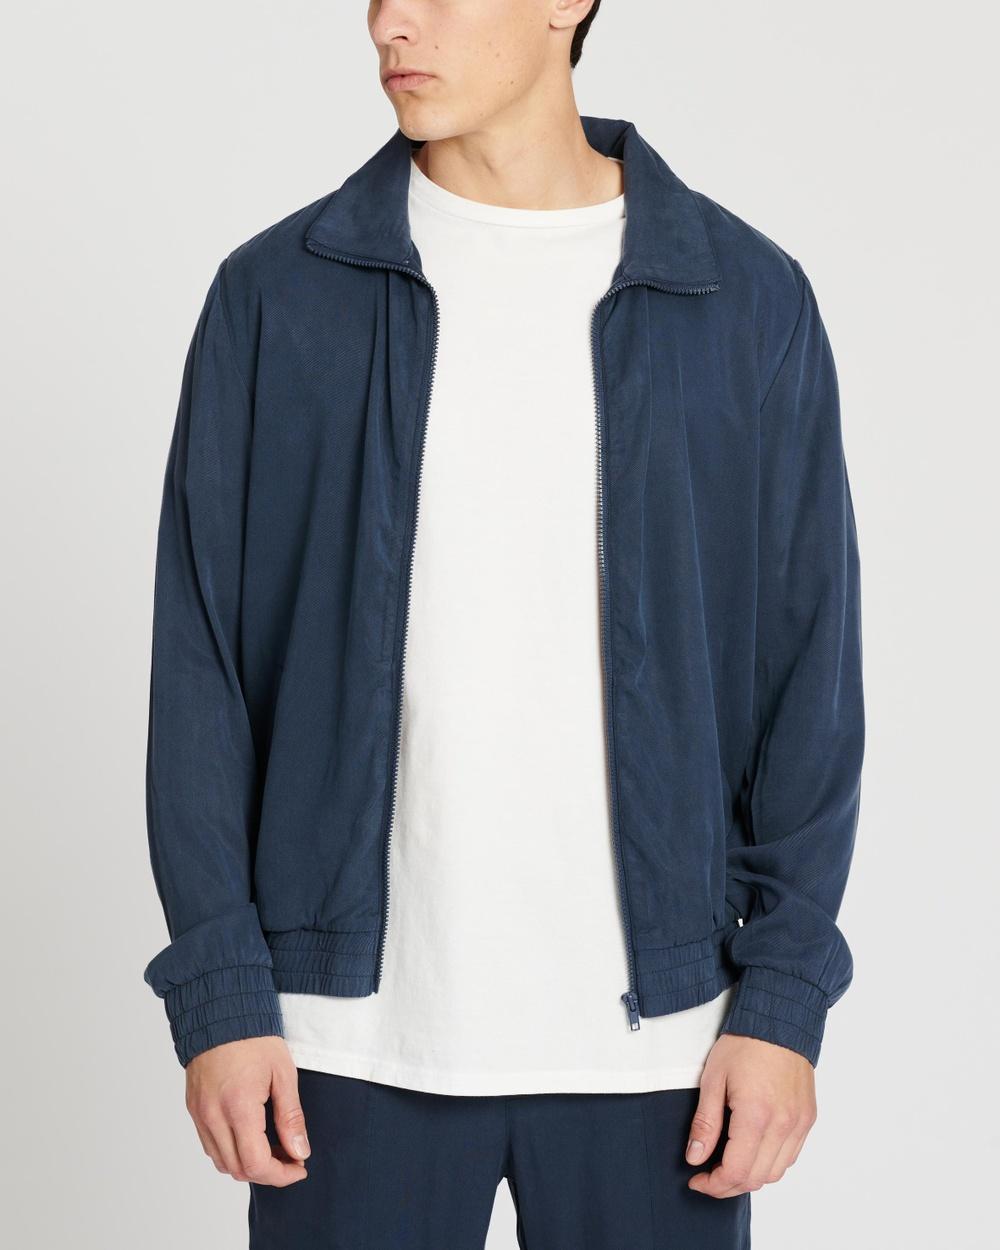 AERE Zip Thru Club Jacket Coats & Jackets Navy